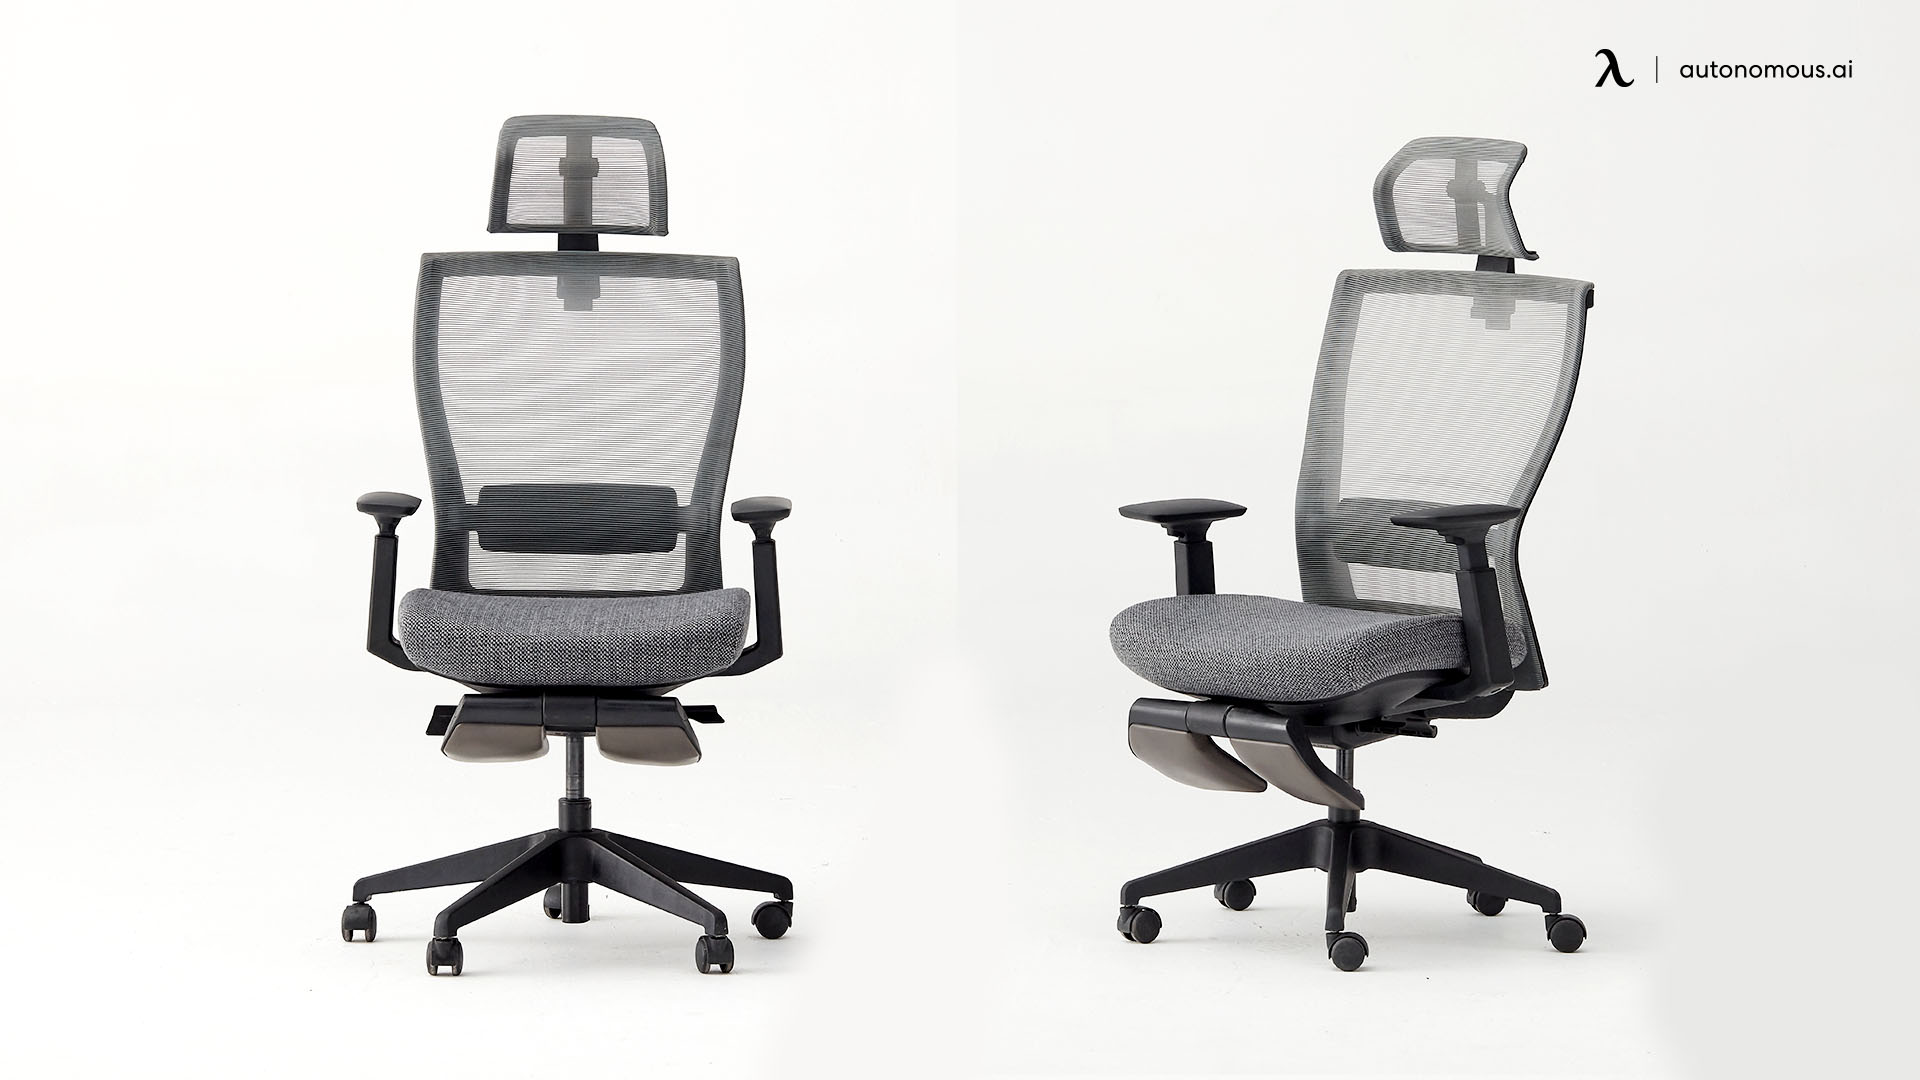 MyoChair - Office Chair Under $500